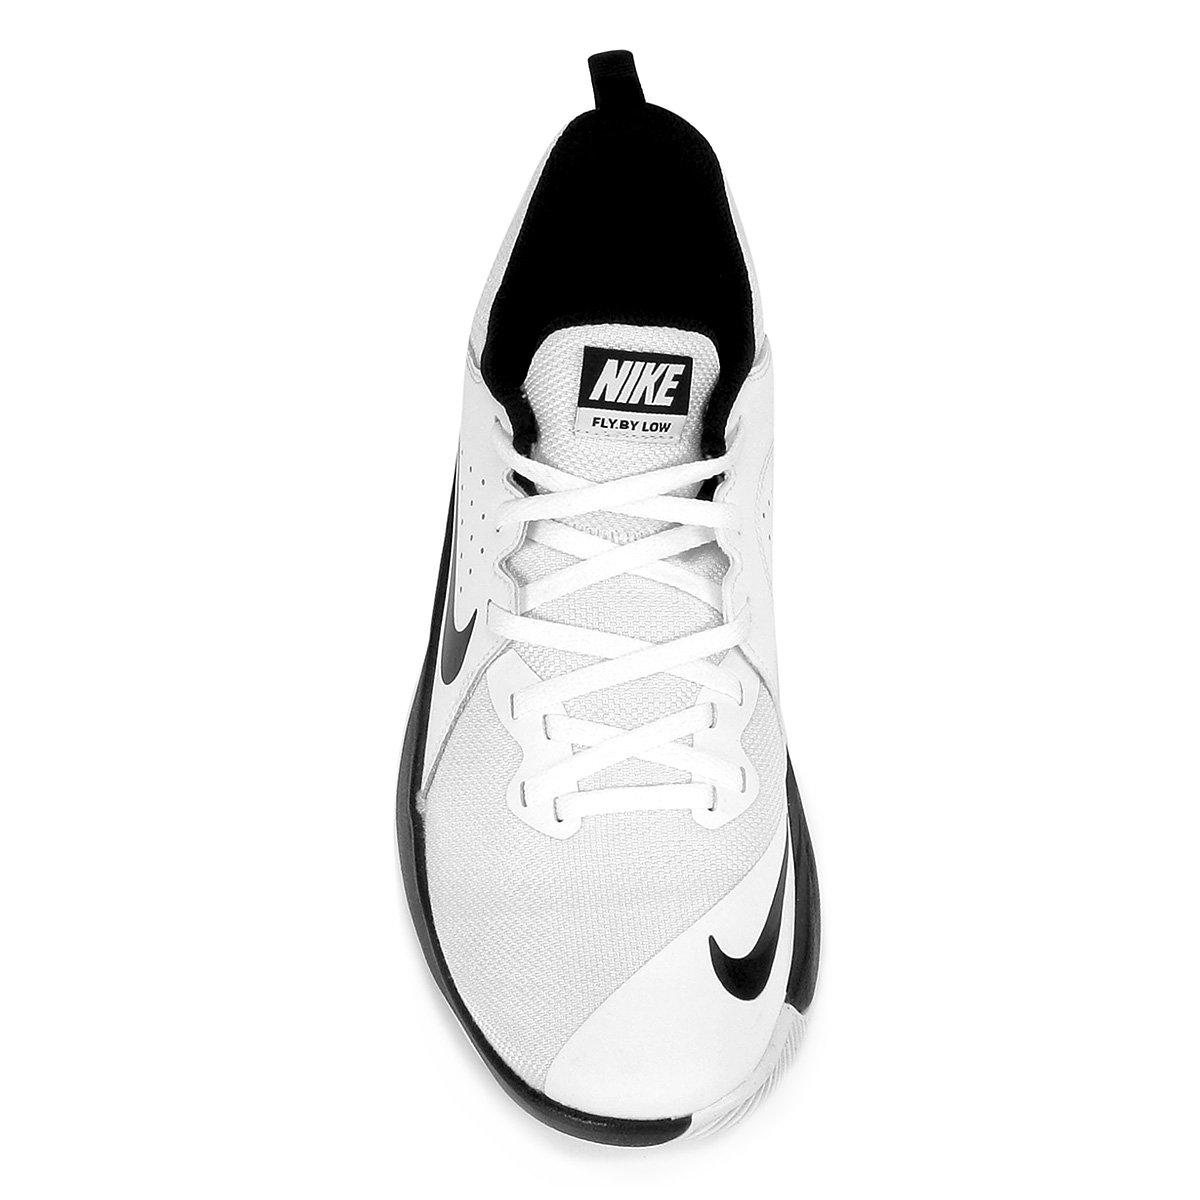 Tênis Nike Fly.By Low Masculino - Branco e Preto - Compre Agora ... 96c7517d77004